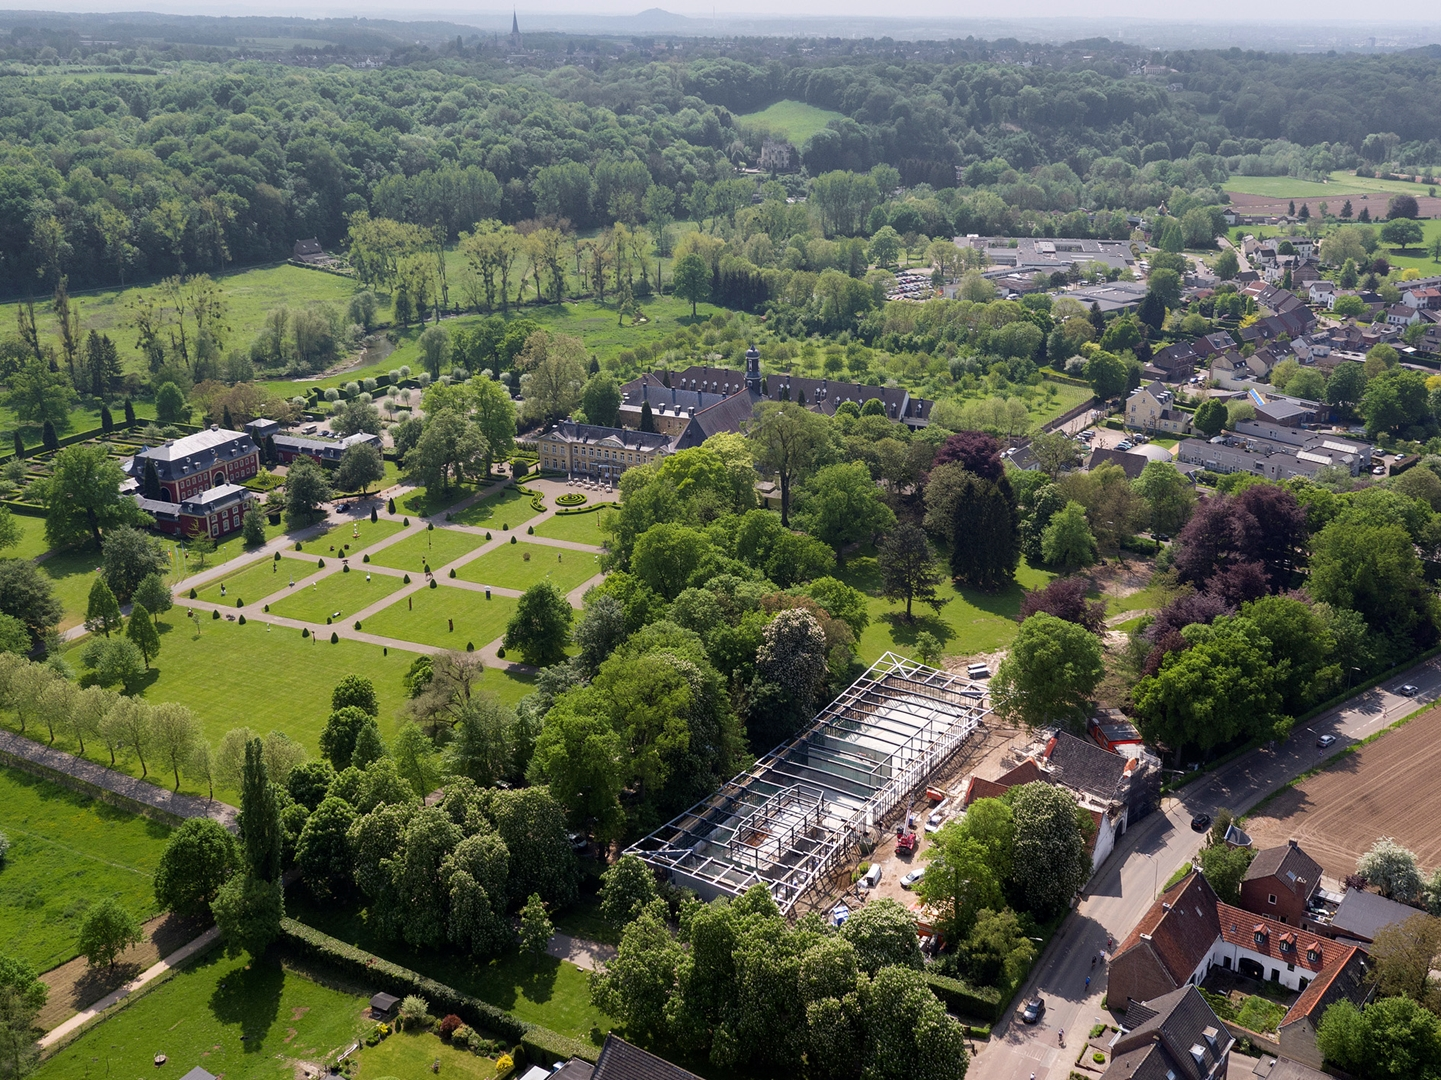 12_St Gerlach pavilion and manor farm_Mecanoo architecten_Photo by Air-Vision 2016 (Copy)